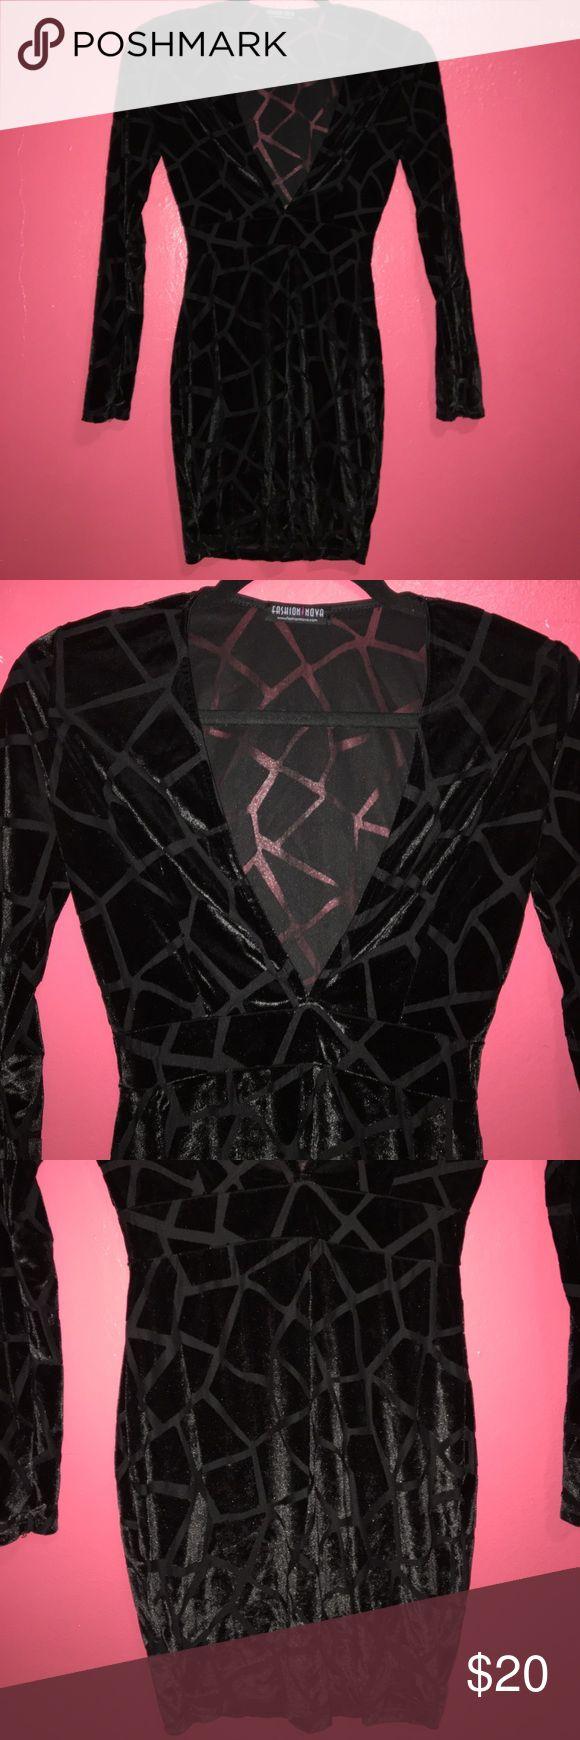 Fashion Nova Velvet Dress Fashion Nova deep v-cut velvet shatter patterned bodycon dress. Size small. Only worn once for about an hour. Still in perfect condition. Black. Fashion Nova Dresses